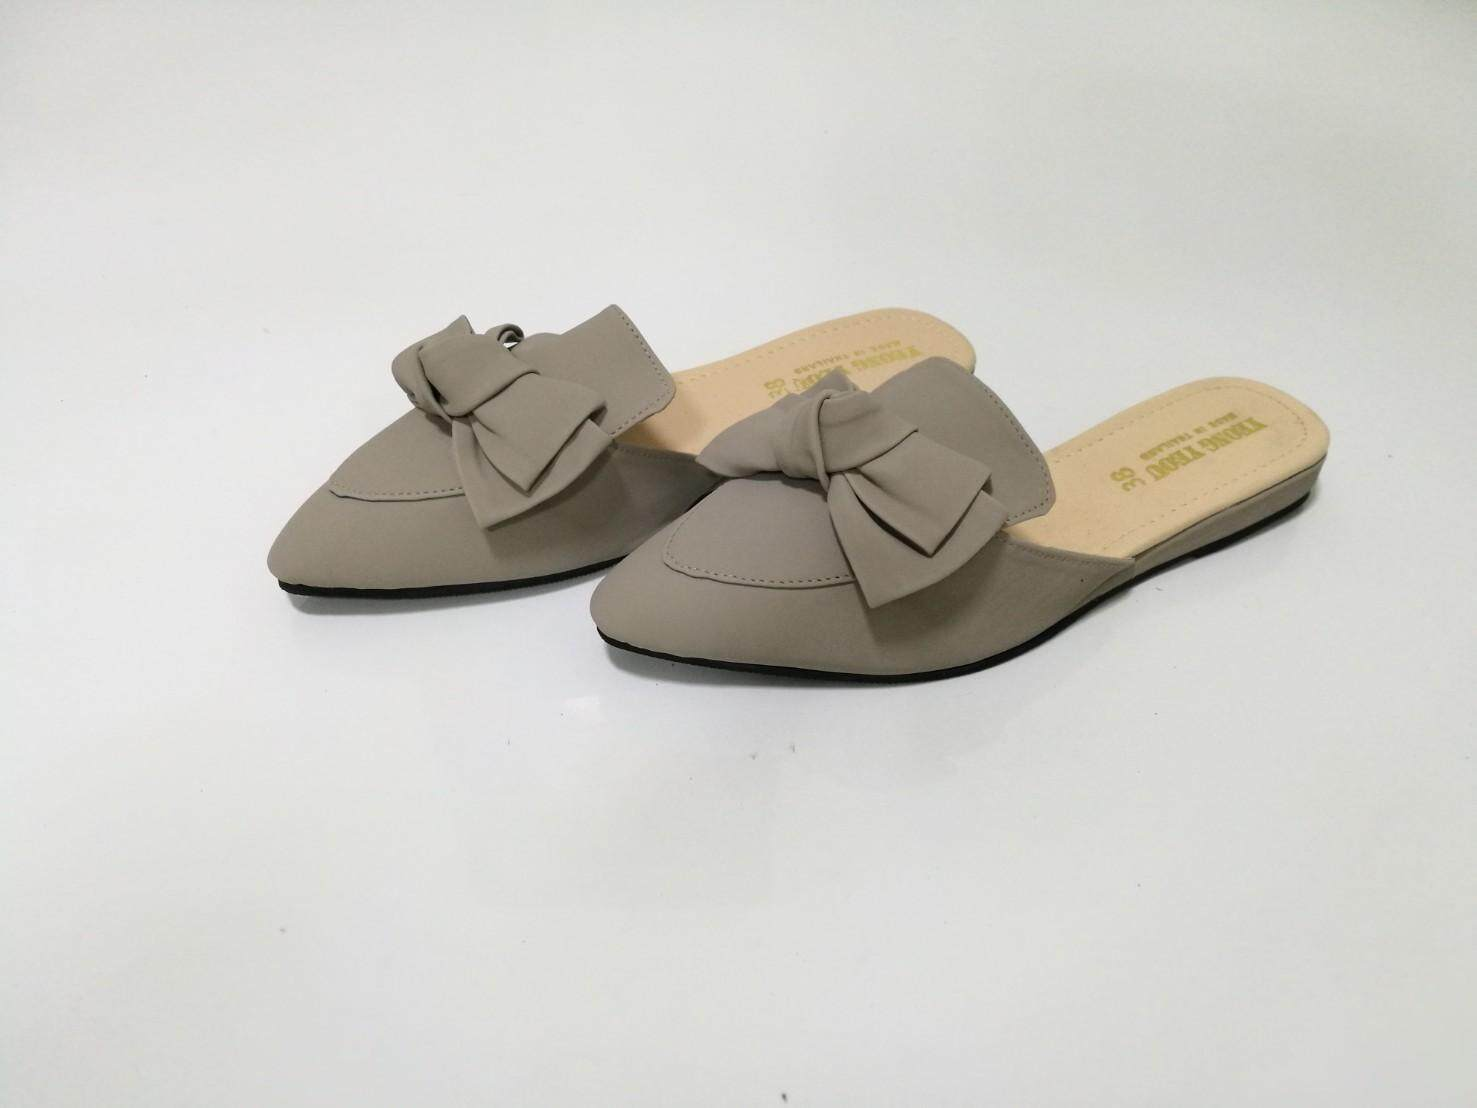 Yeong Yeou รองเท้าคัทชูหน้าโบว์หัวแหลมเปิดส้น By Yeong Yeou.